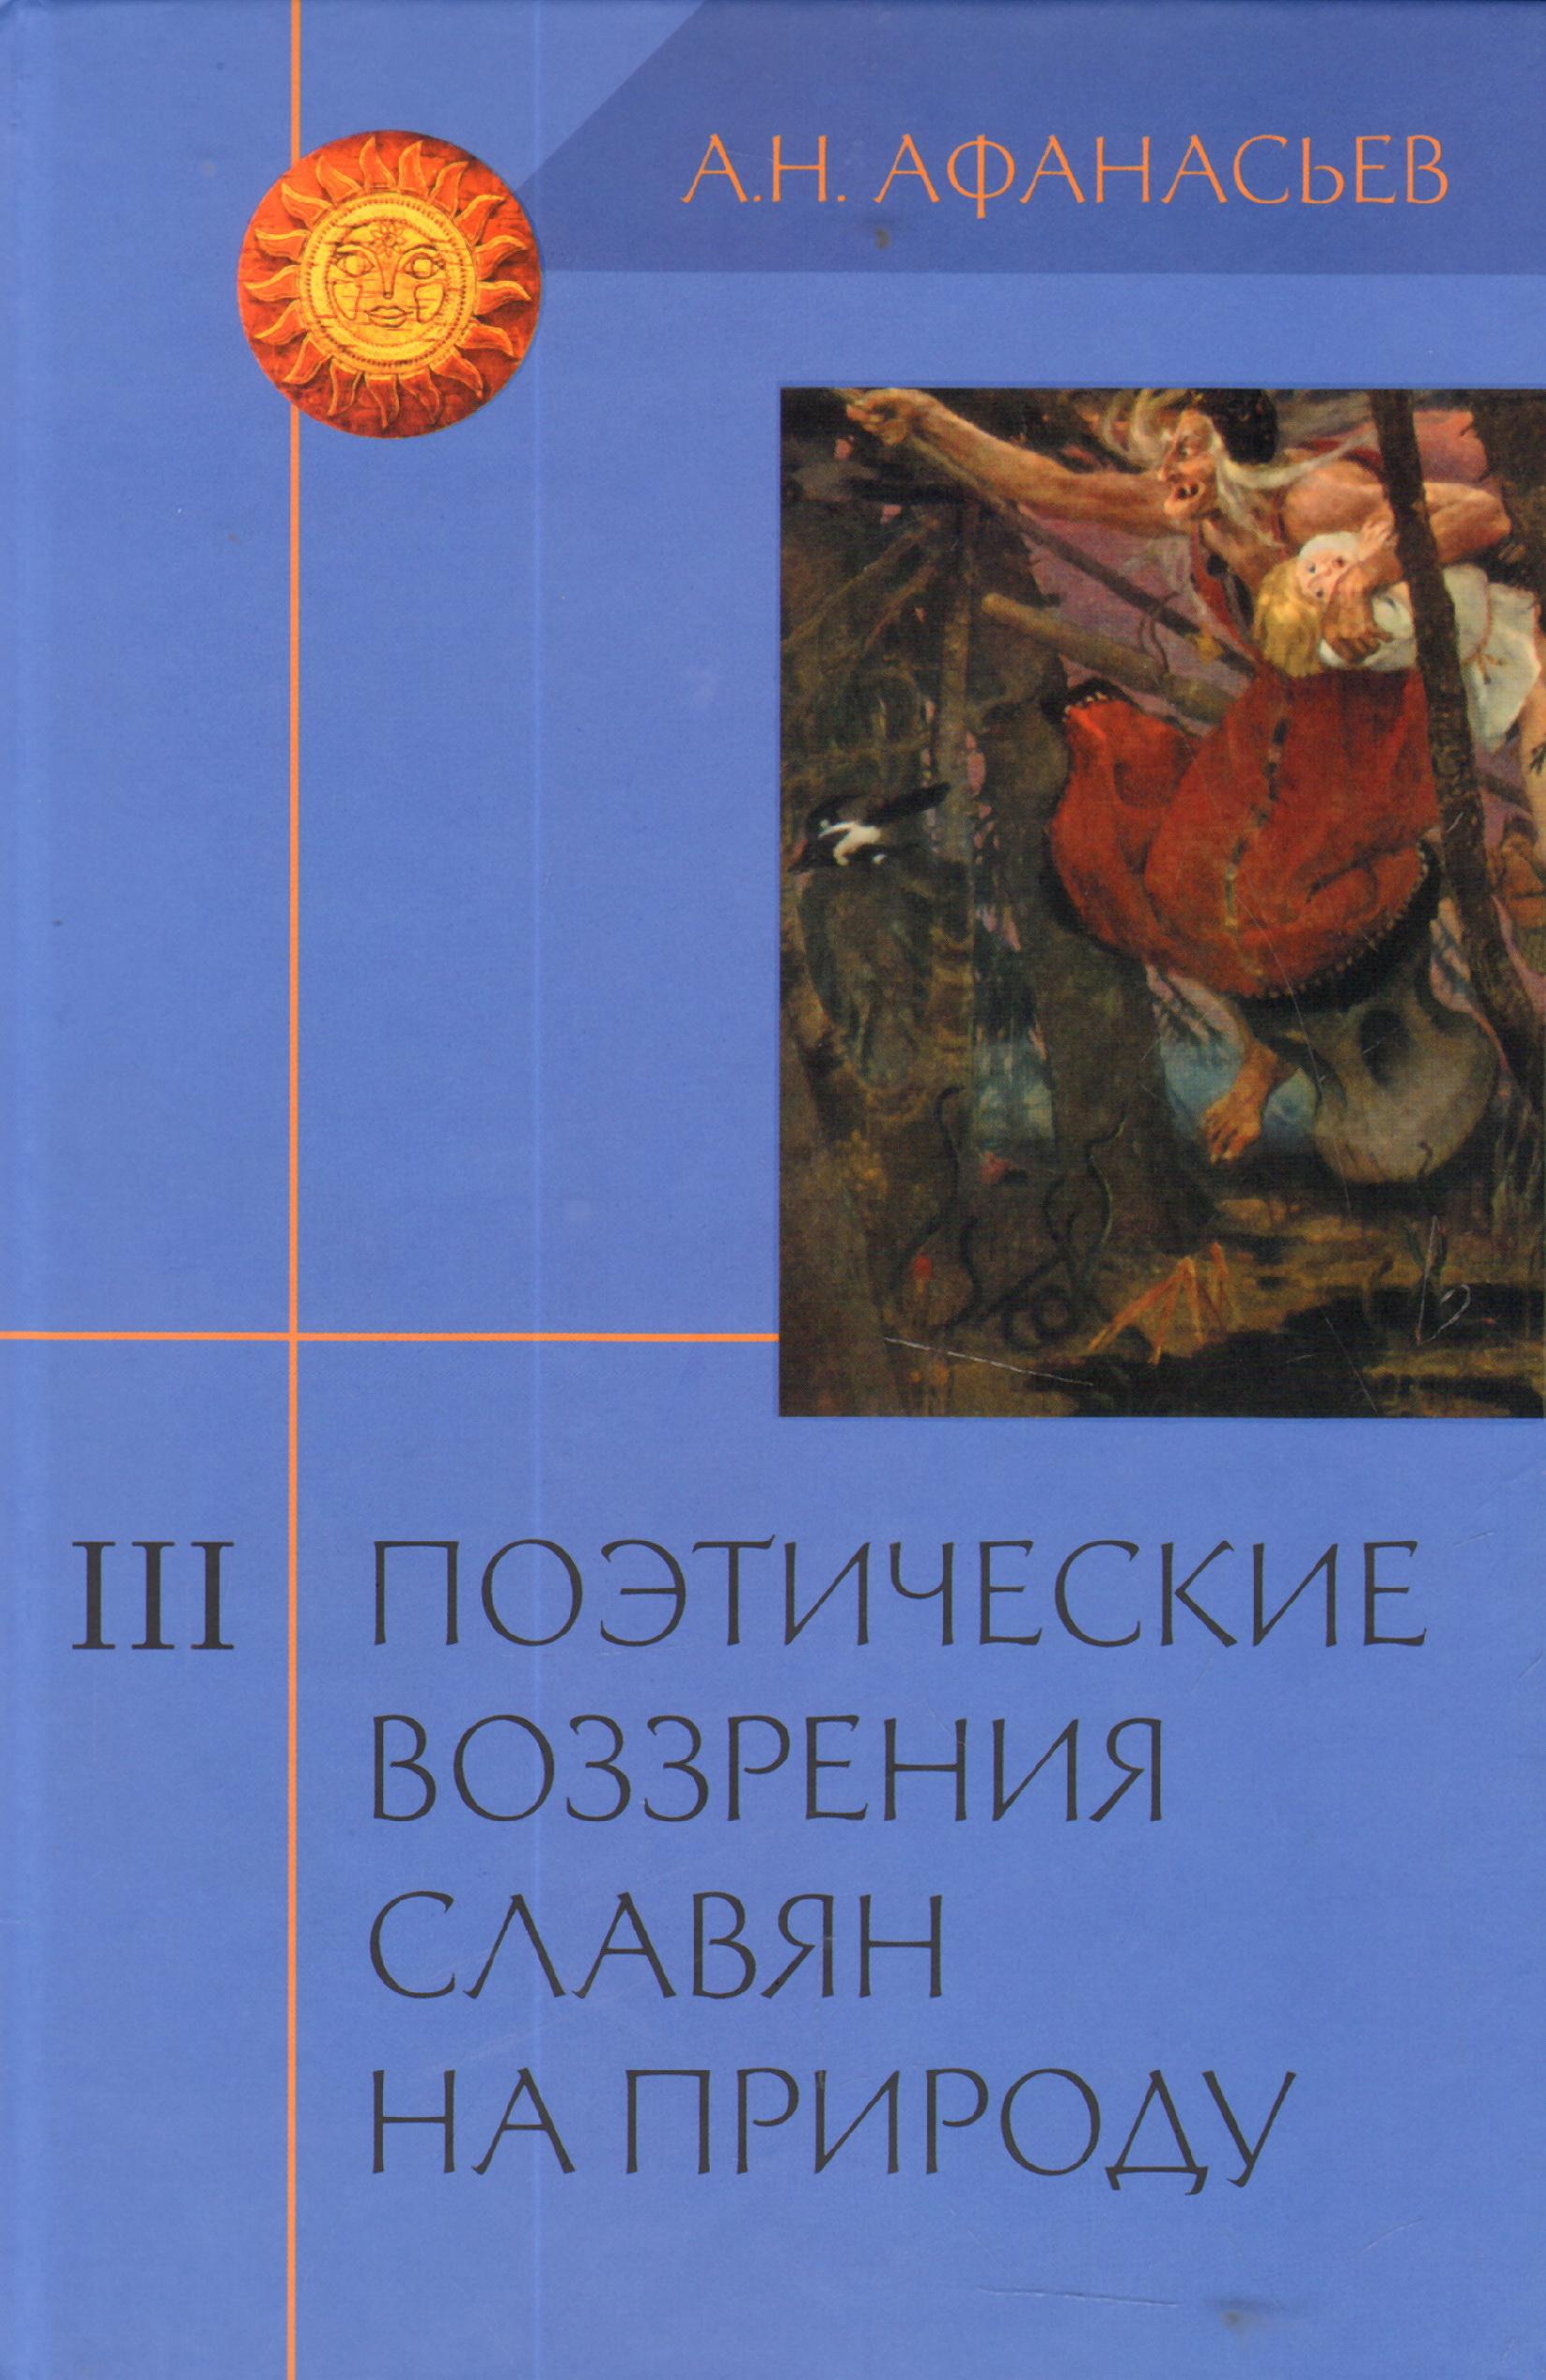 Поэтические воззрения славян на природу.Т-3